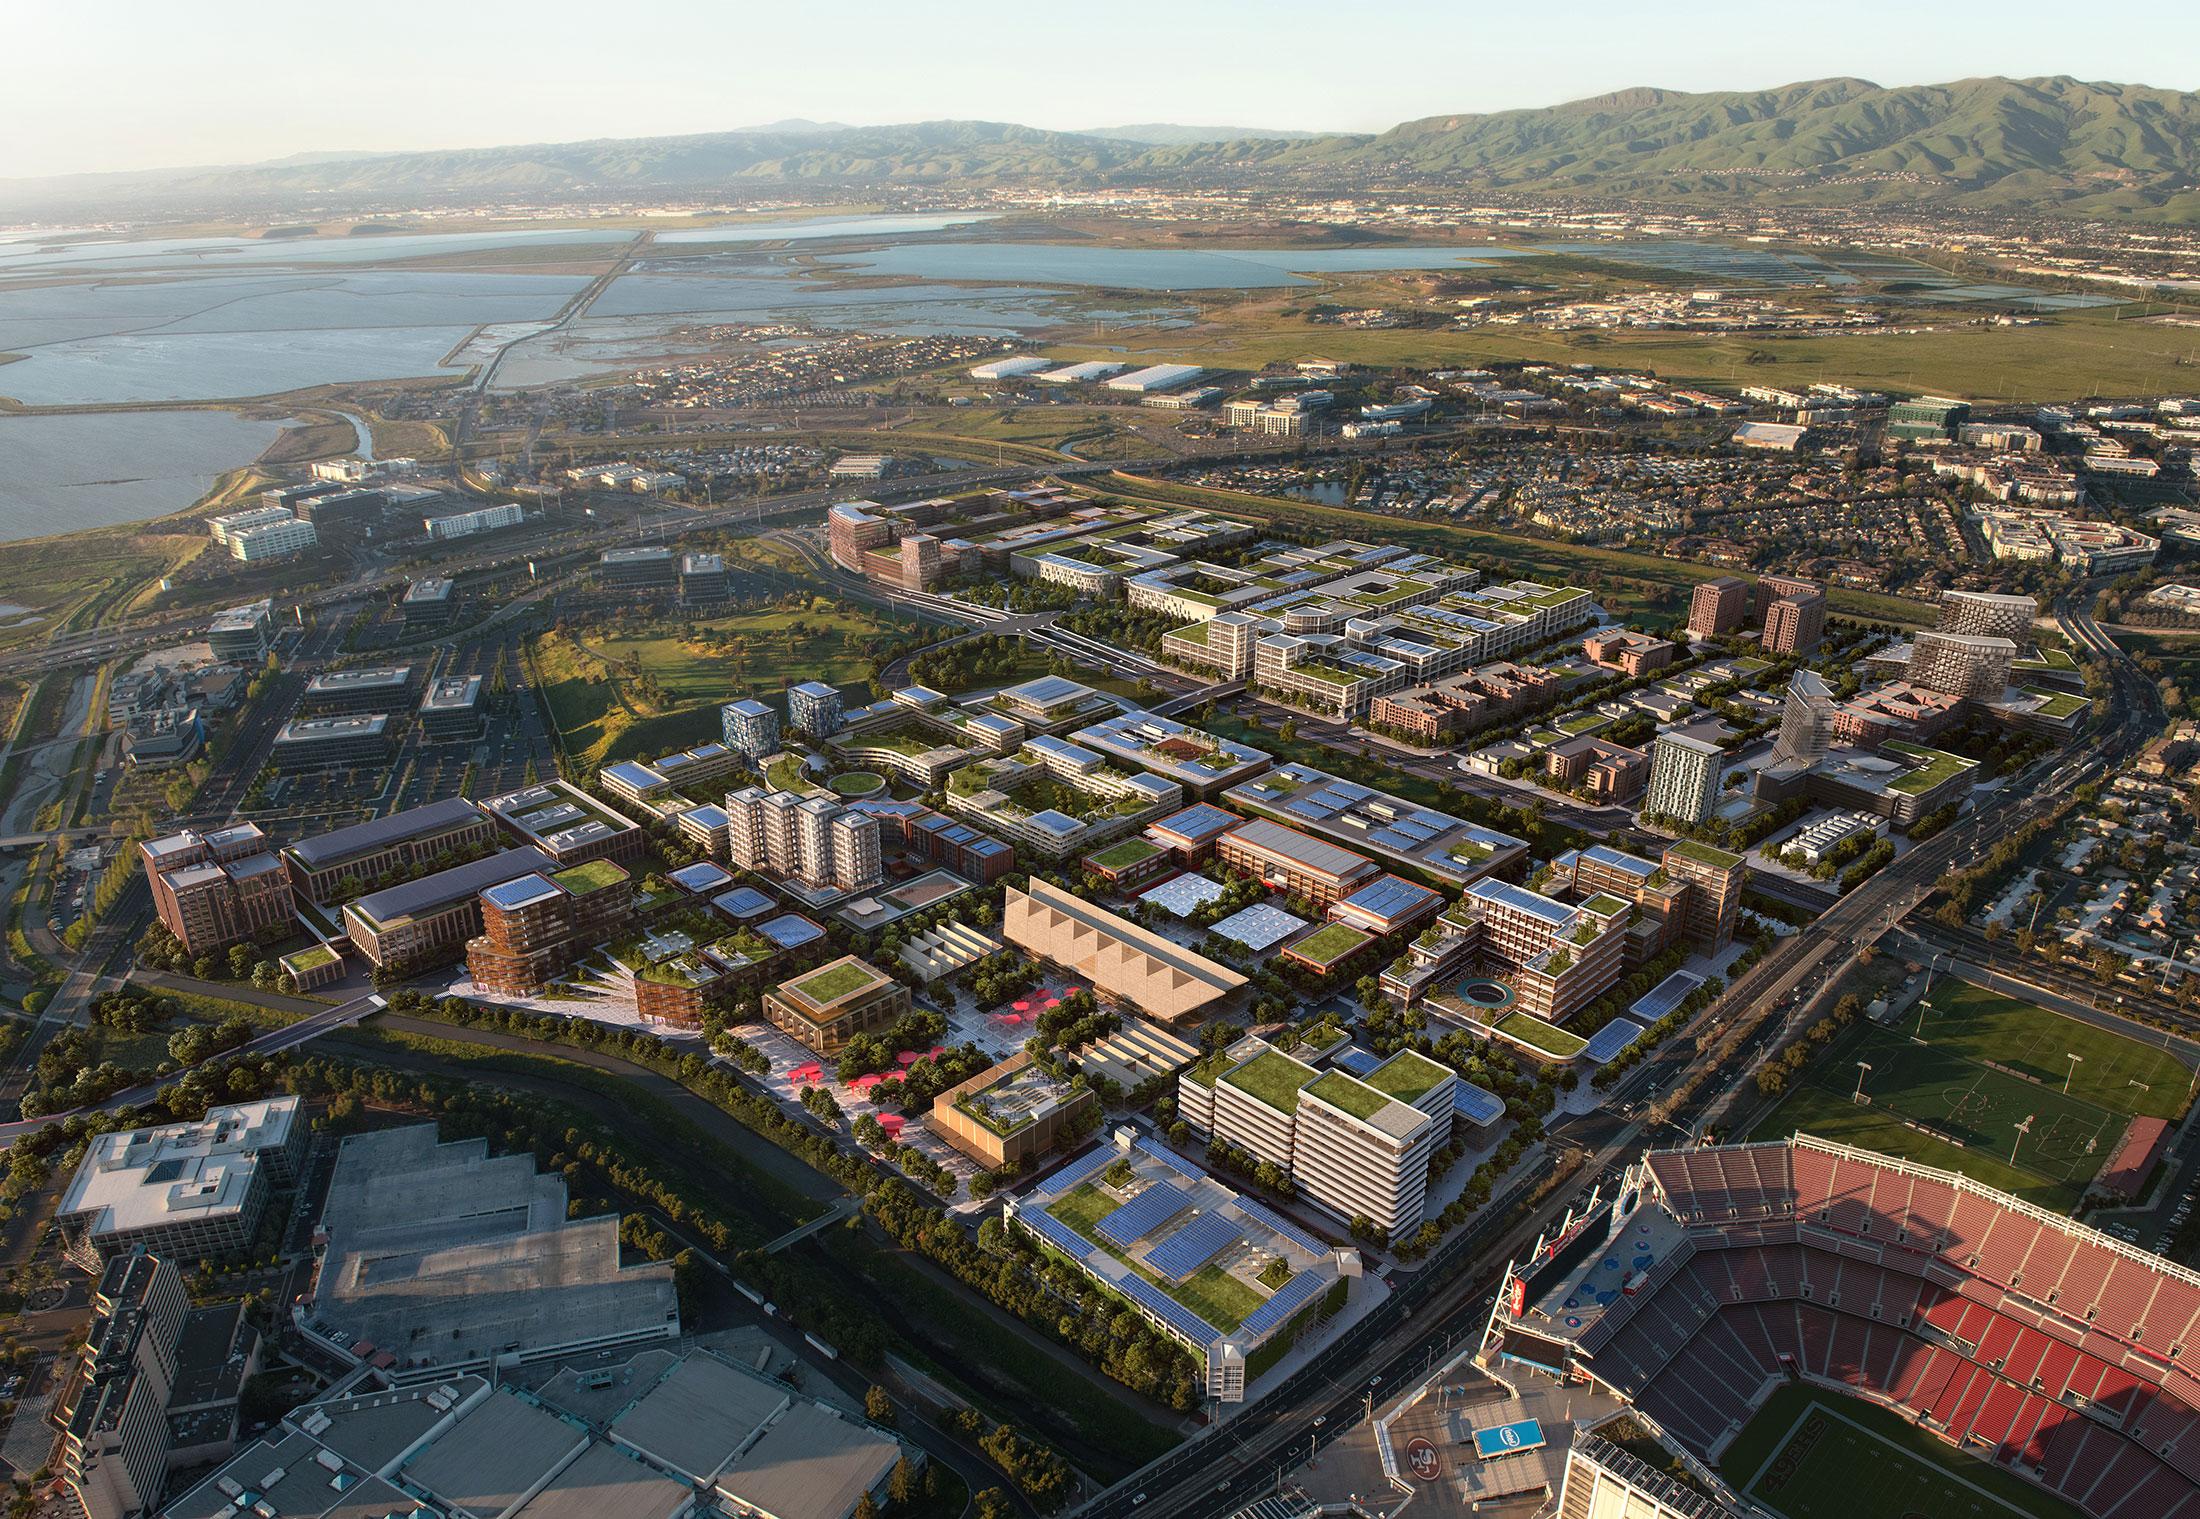 In Silicon Valley, an $8B mega-development will soon break ground